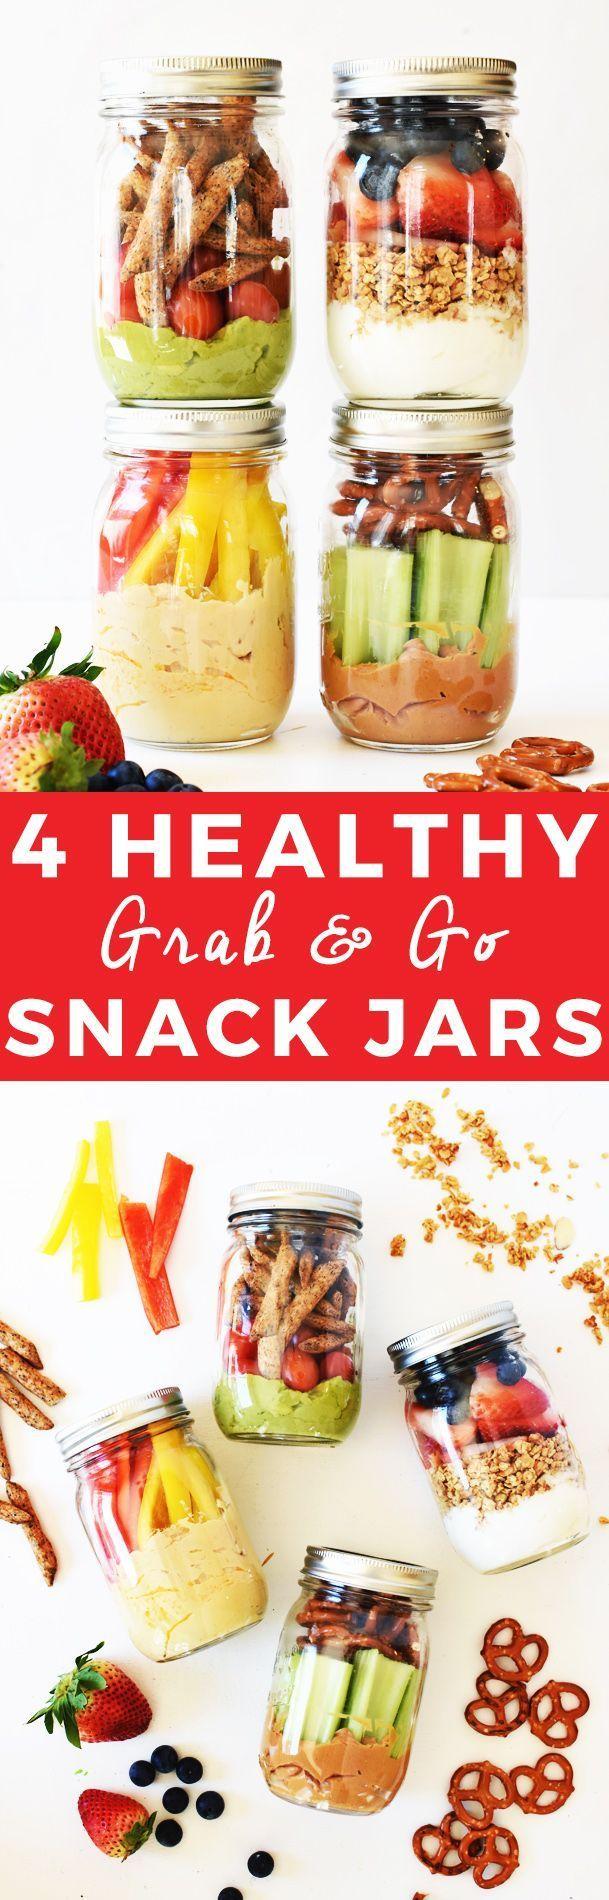 4 Healthy Grab-and-Go Snack Jars | healthy snack recipes, healthy snack jars, easy snack recipes, how to make a snack jar, healthy snack ideas, snack recipes healthy, snack jar ideas, on the go snack ideas || The Butter Half via @thebutterhalf via @thebut